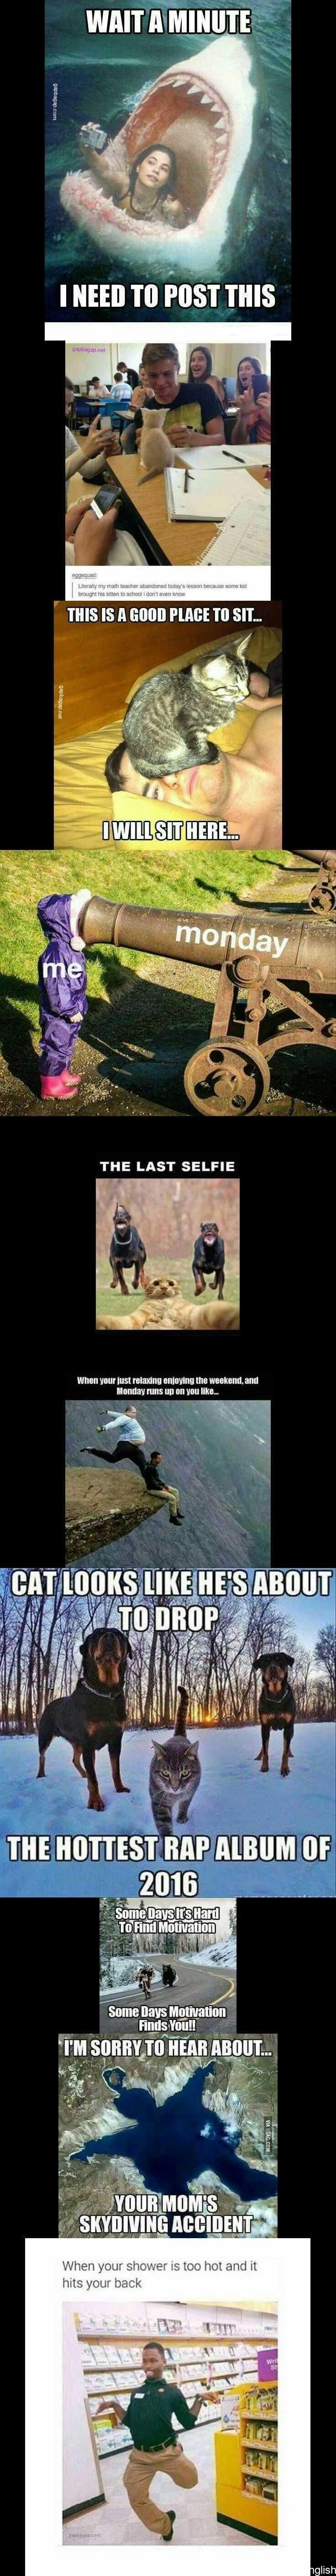 New Funny Imagenes  Top 10 Funniest Memes | Random Stuff | Pinterest | Funny memes, Memes and Top 10... - #funniest #funny #Memes #pinterest #Random #stuff #Top 4